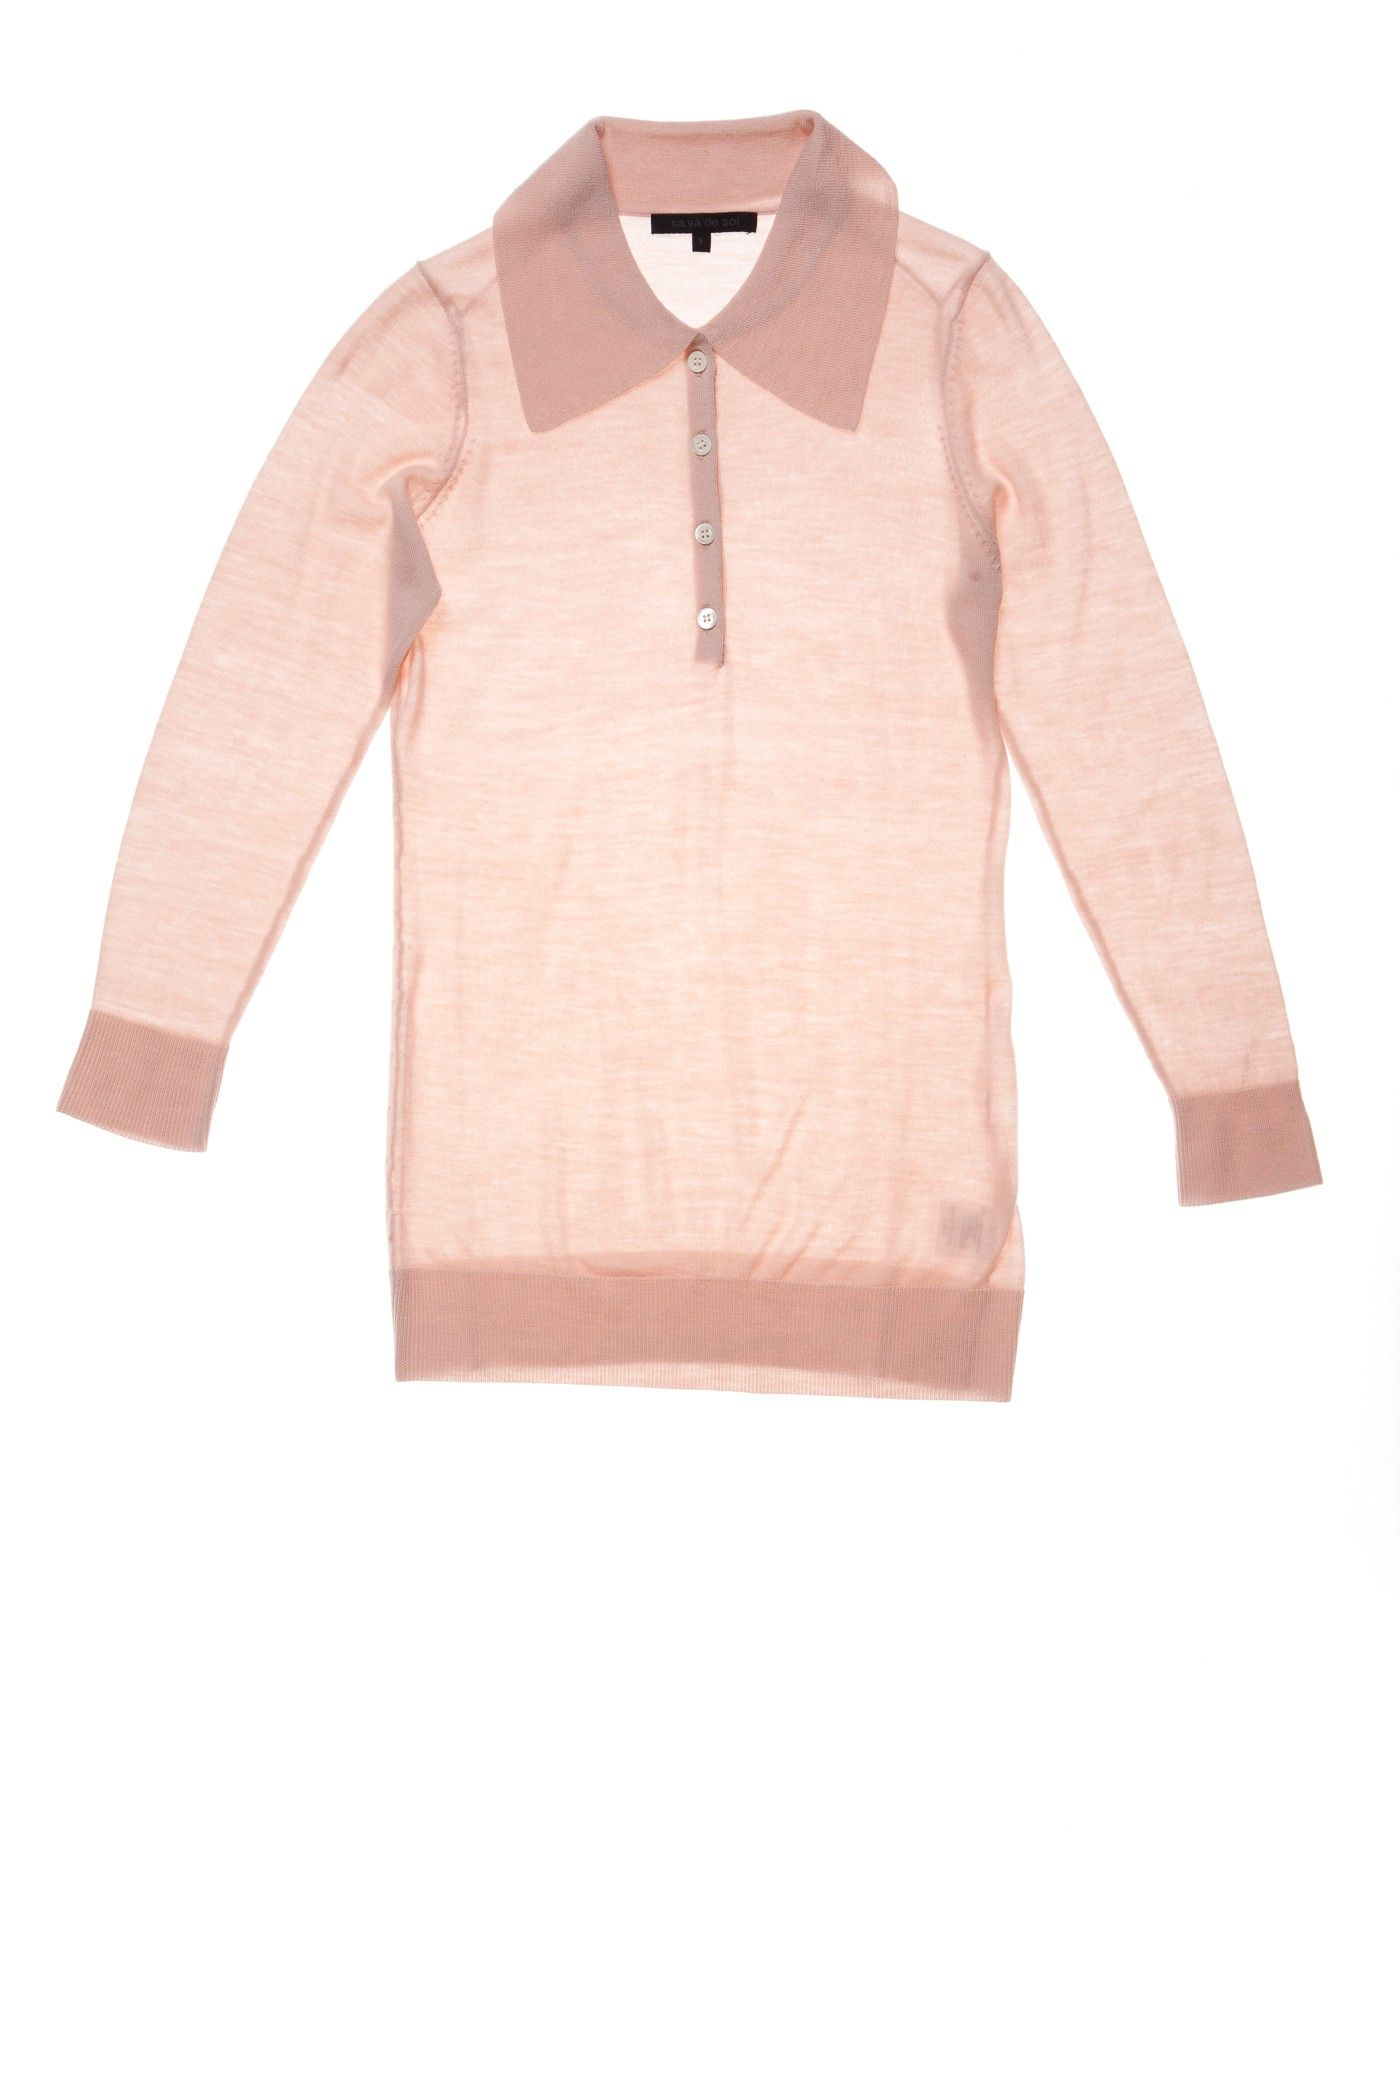 Toni | 3/4 sleve polo | Extra-Fine Merino Super 140 #cavadesoi #cvds #knitwear #fashion #wool #merino #polo #sweater #pink #rose #geisha // February